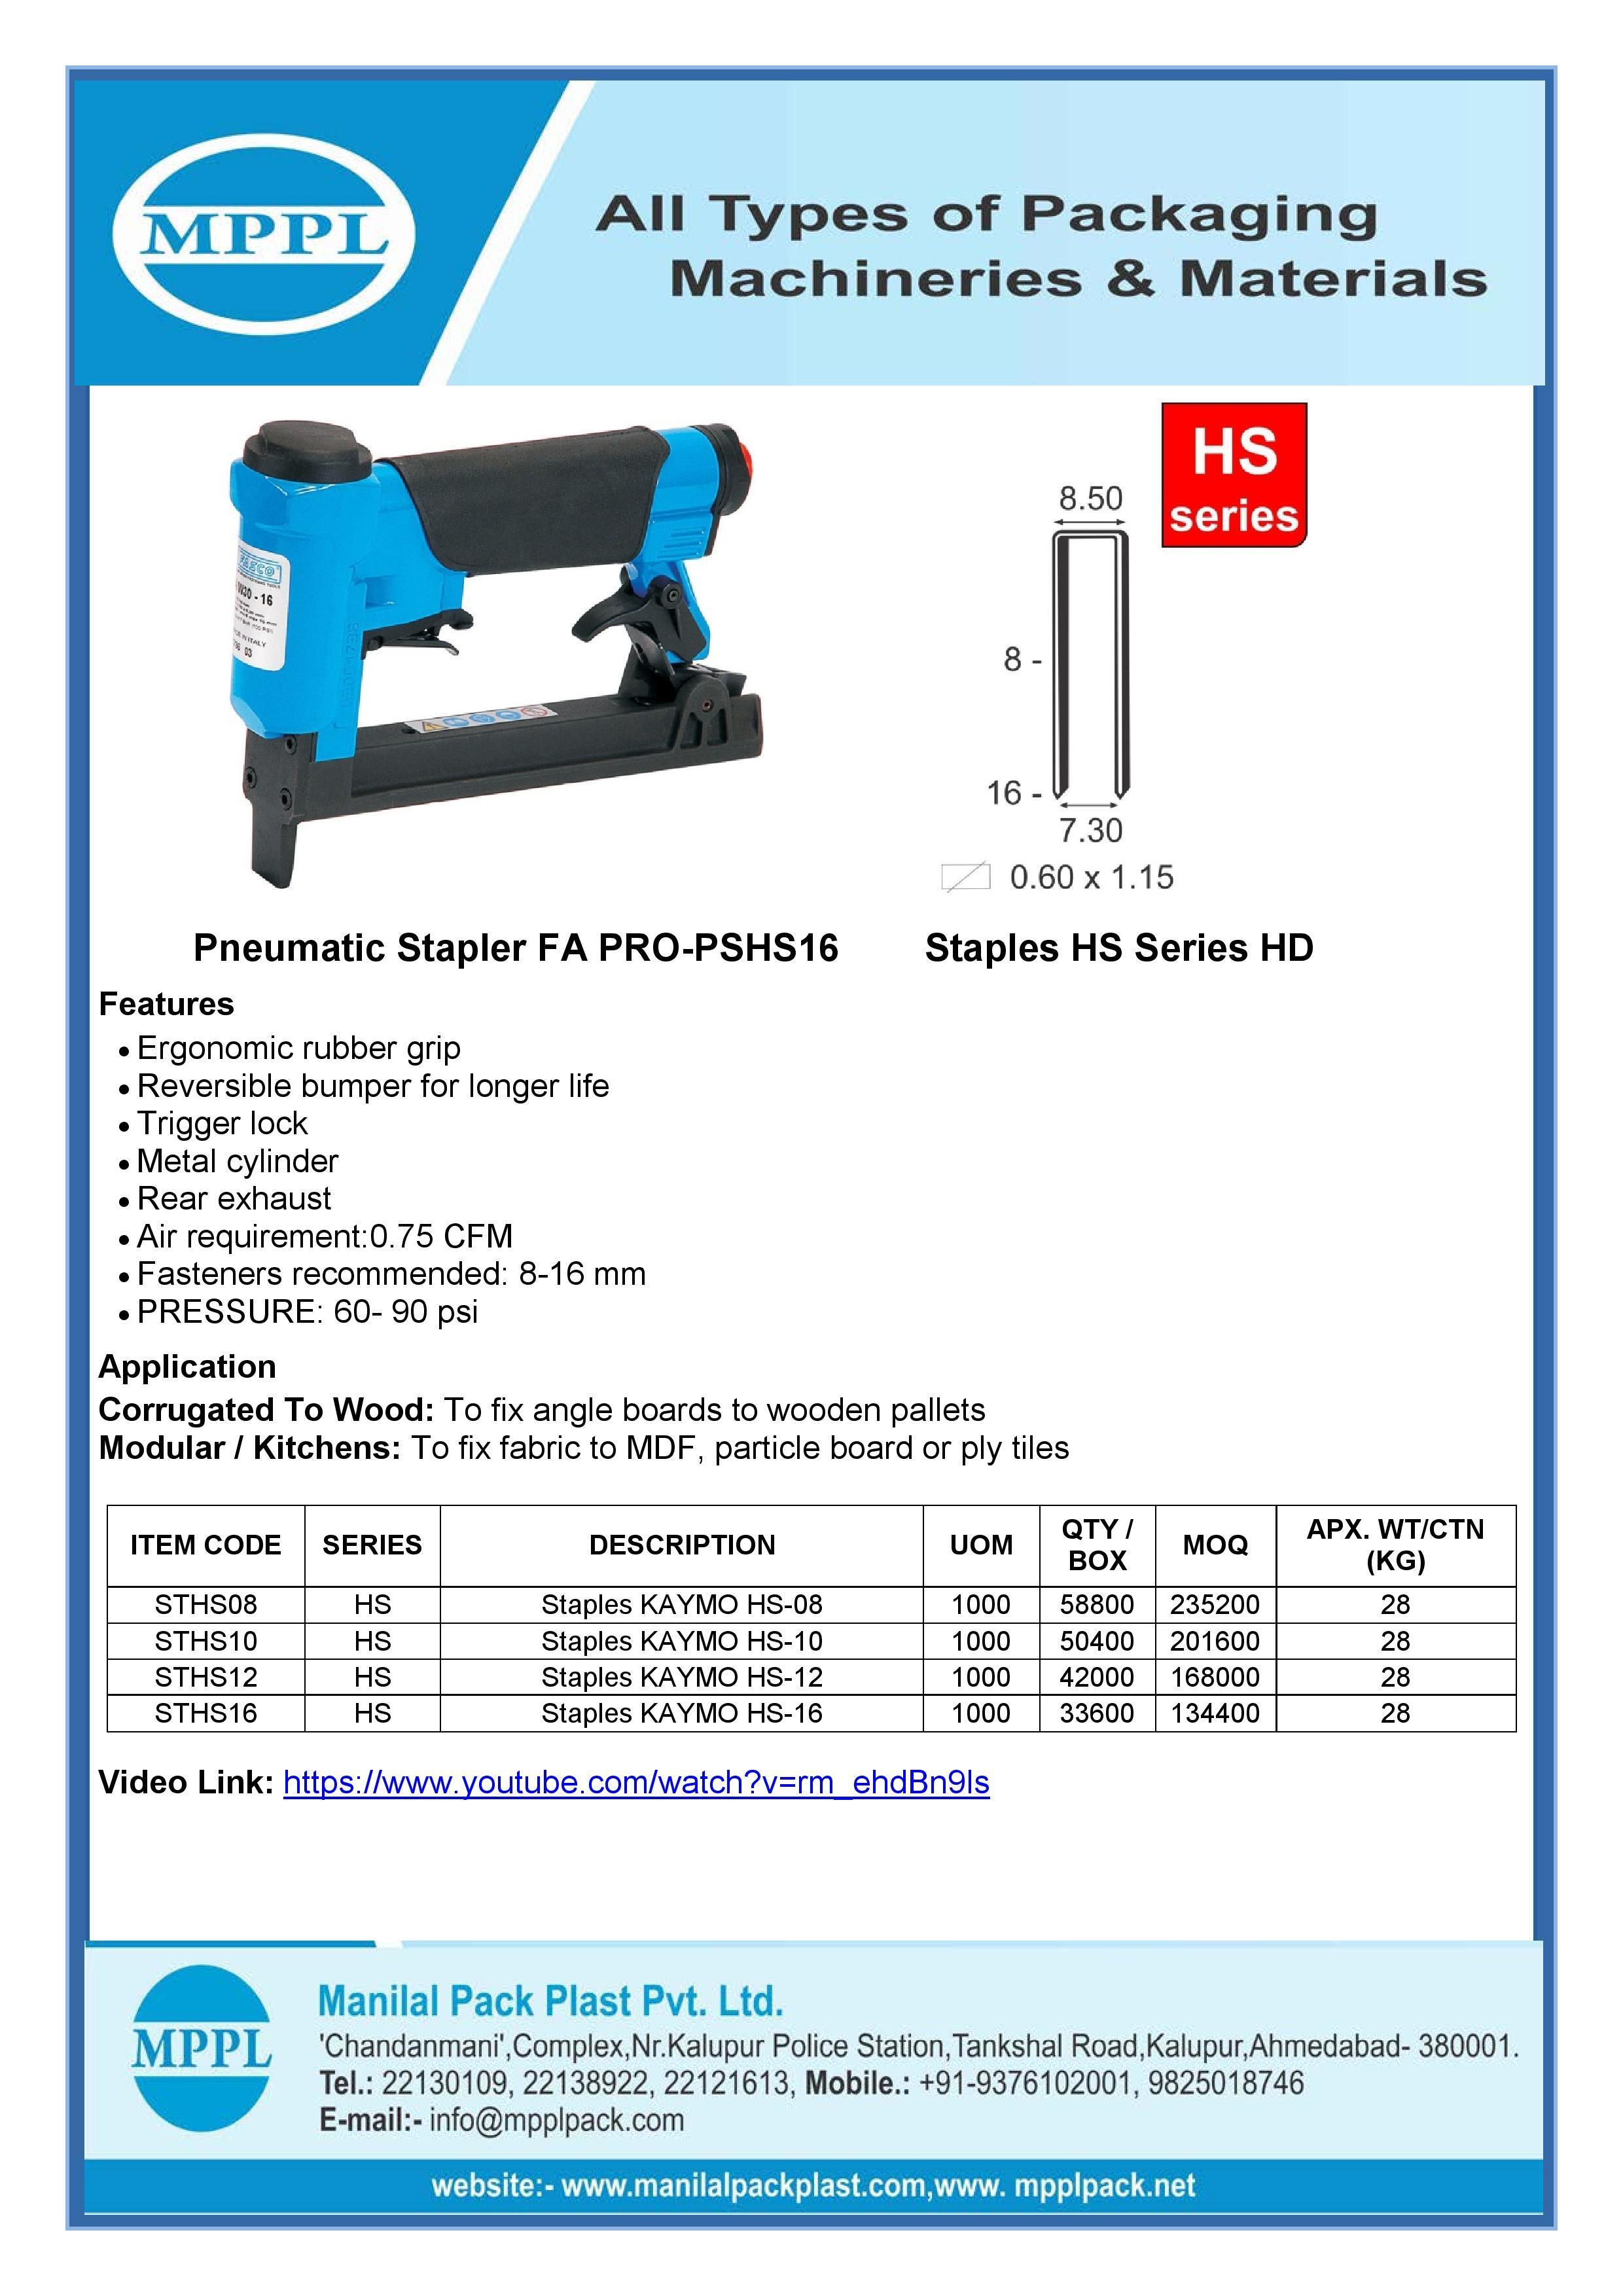 Pneumatic Stapler FA PRO-PSHS16